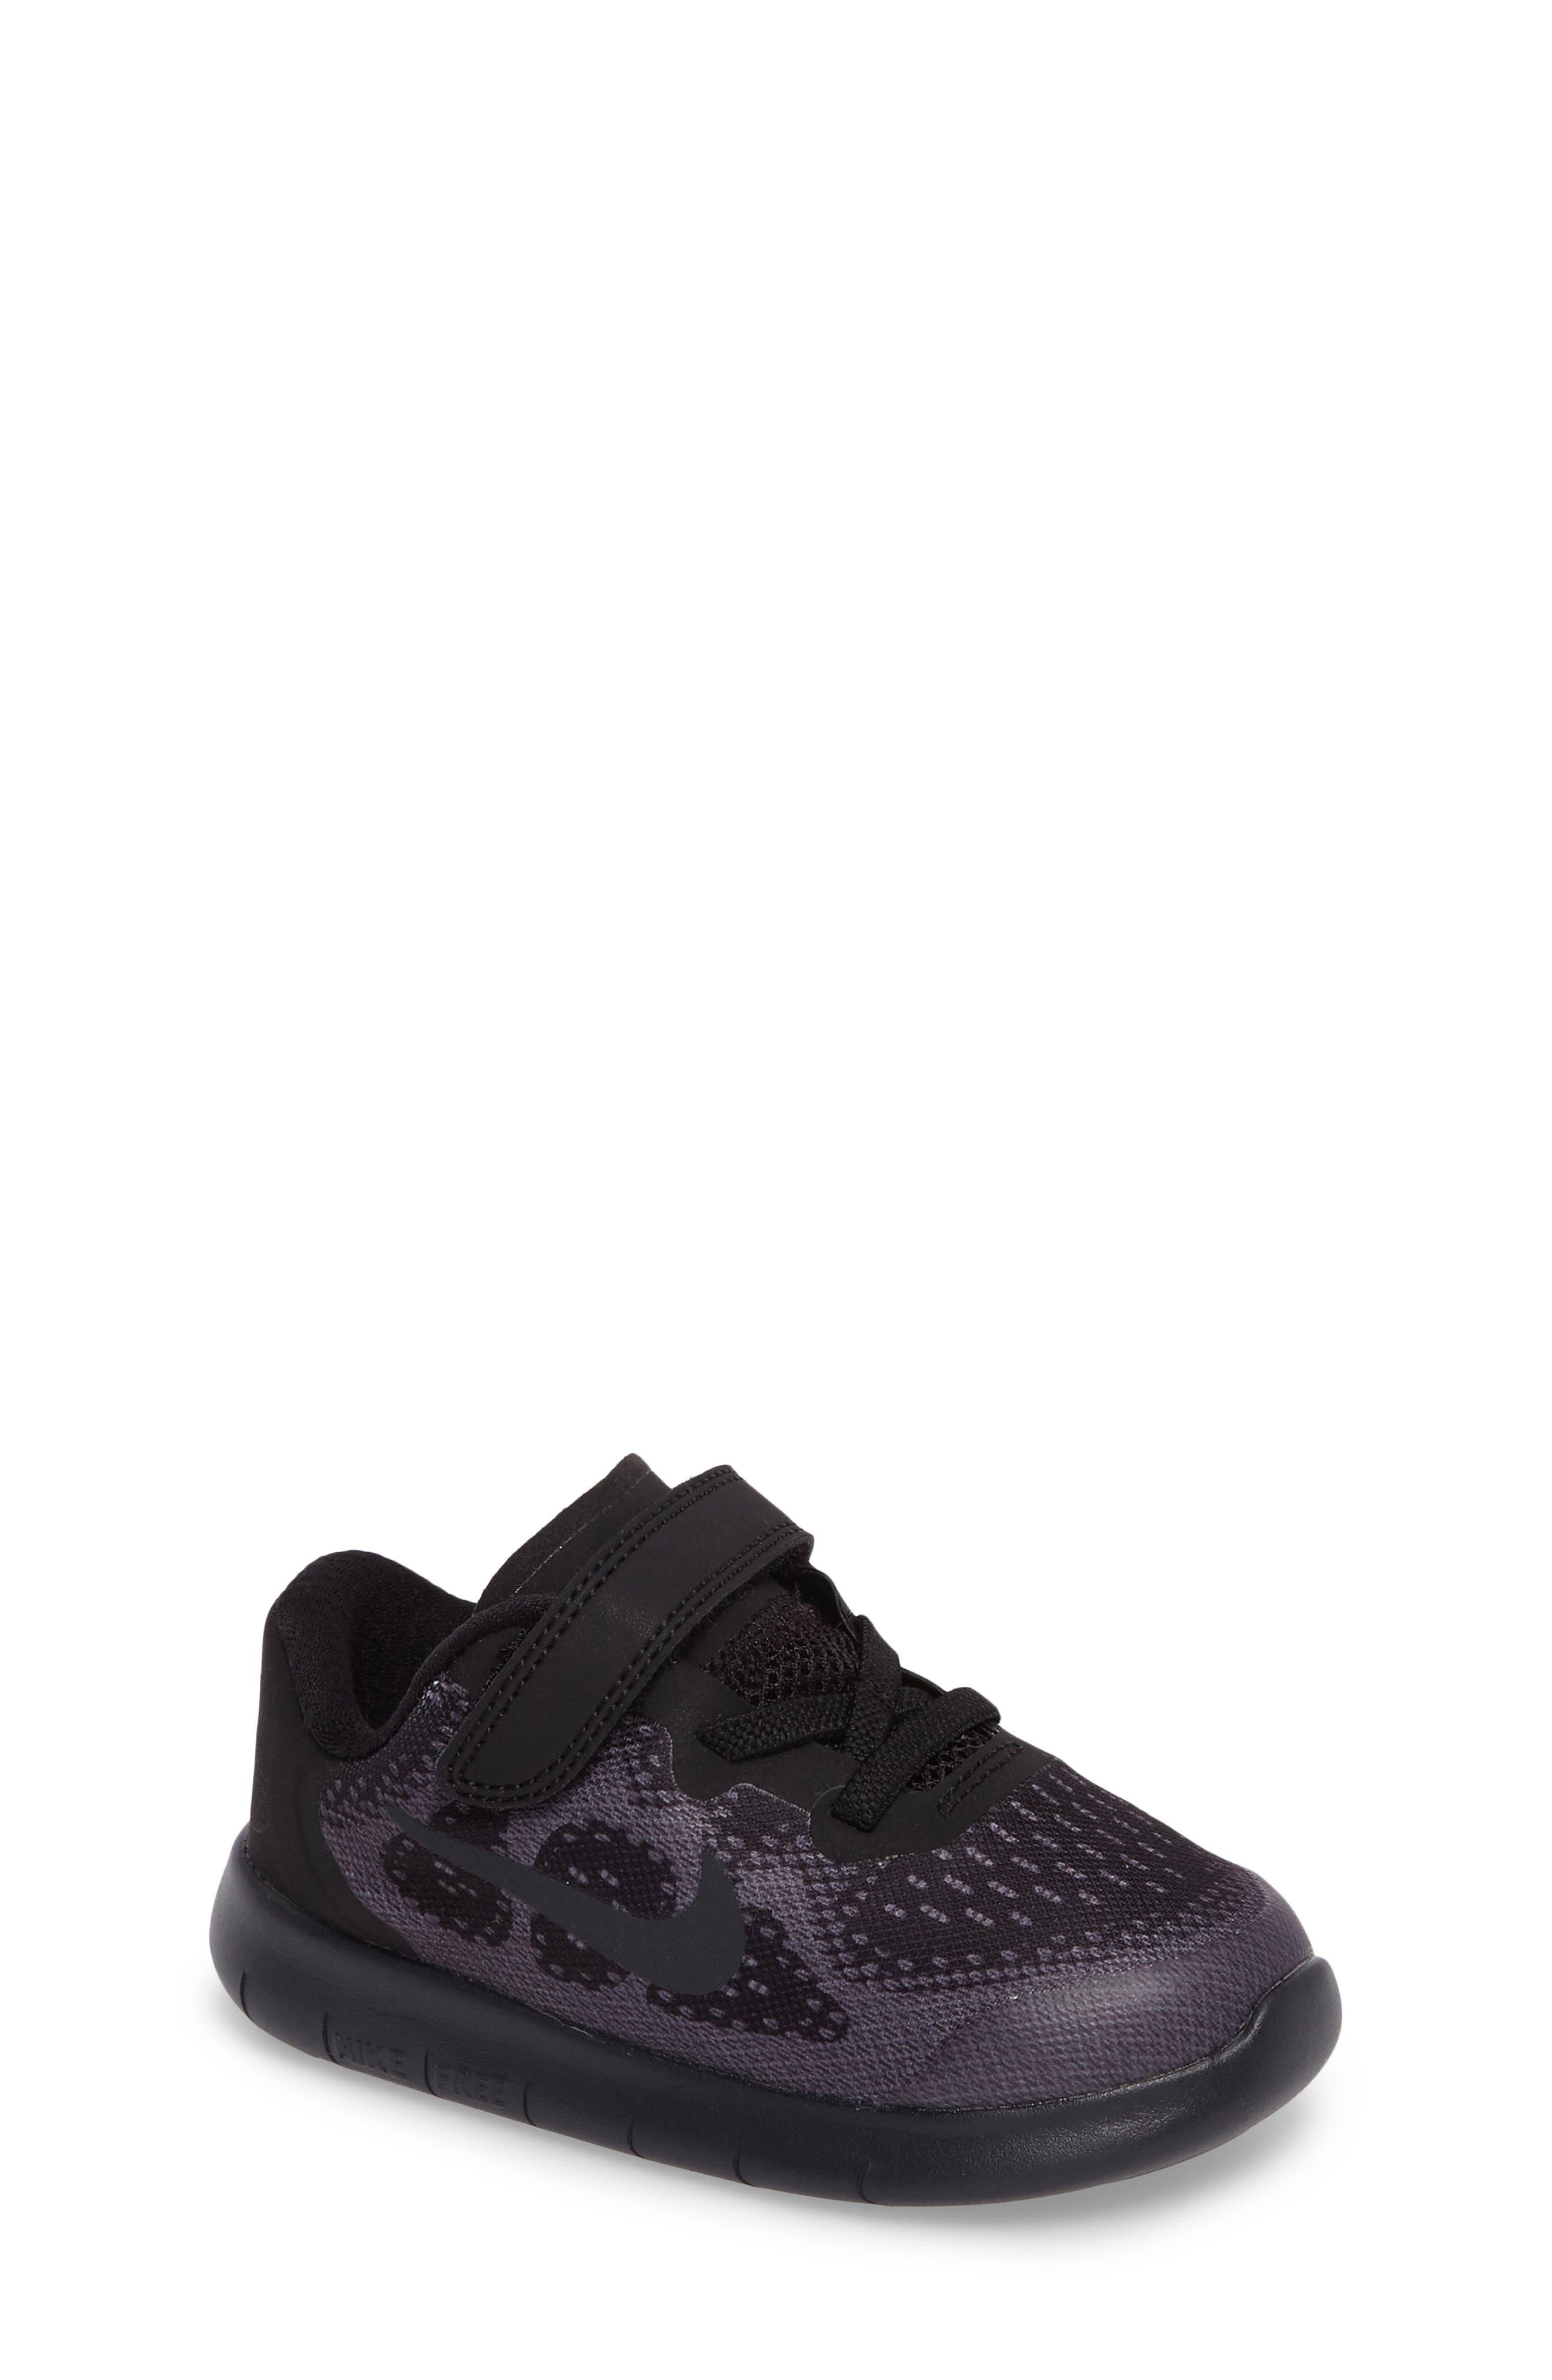 Free RN 2017 Sneaker,                             Main thumbnail 1, color,                             001